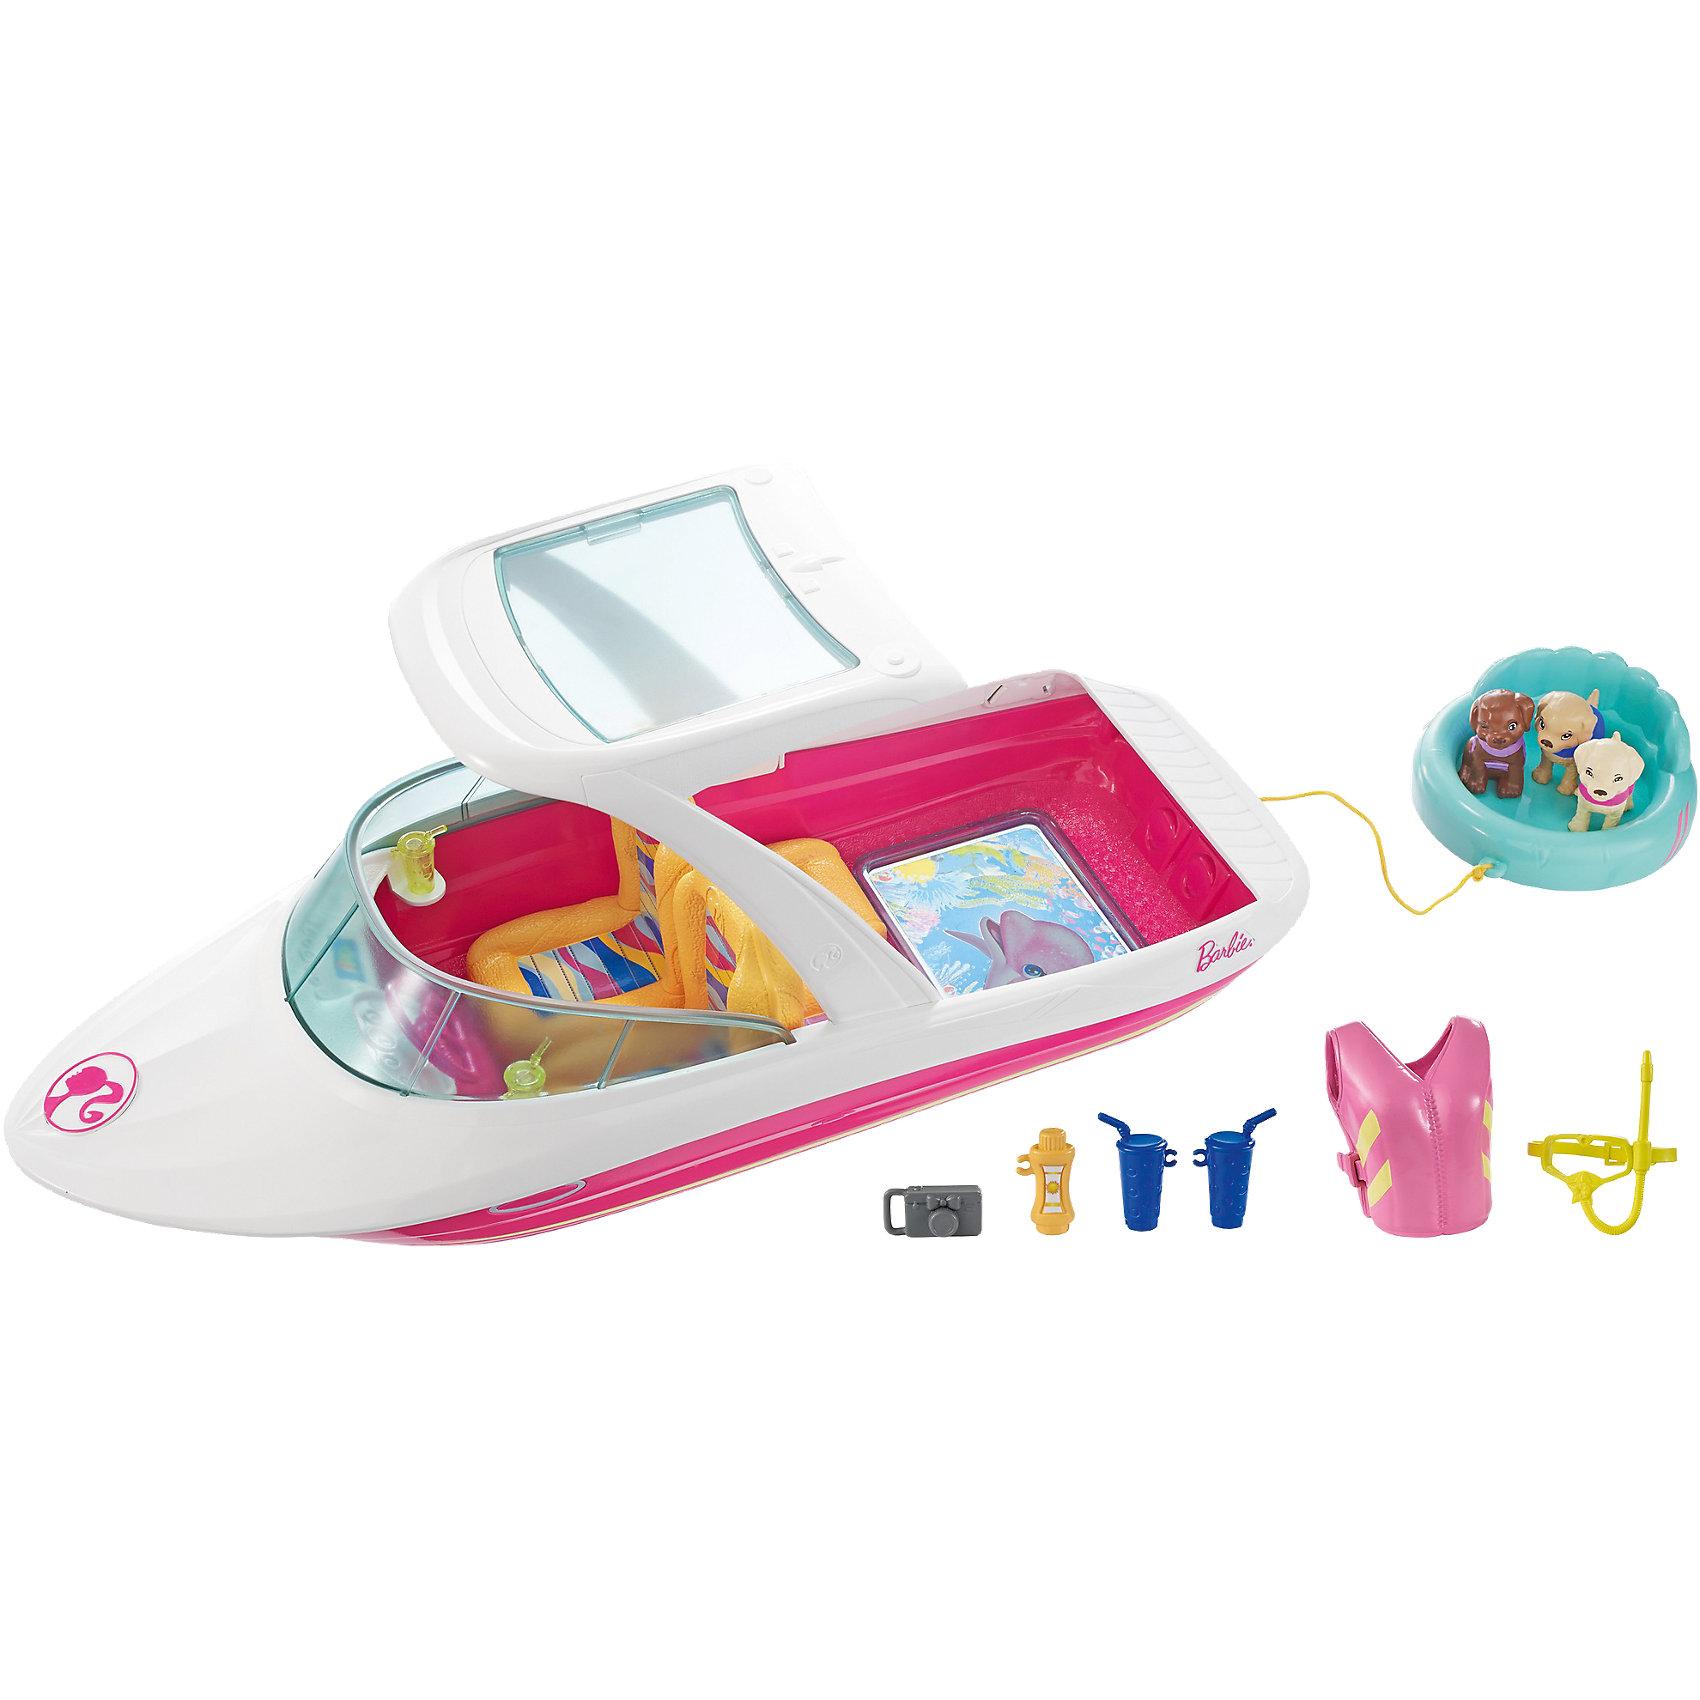 Моторная лодка с аксессуарами BarbieBarbie<br><br><br>Ширина мм: 462<br>Глубина мм: 233<br>Высота мм: 187<br>Вес г: 1062<br>Возраст от месяцев: 36<br>Возраст до месяцев: 72<br>Пол: Женский<br>Возраст: Детский<br>SKU: 6739683